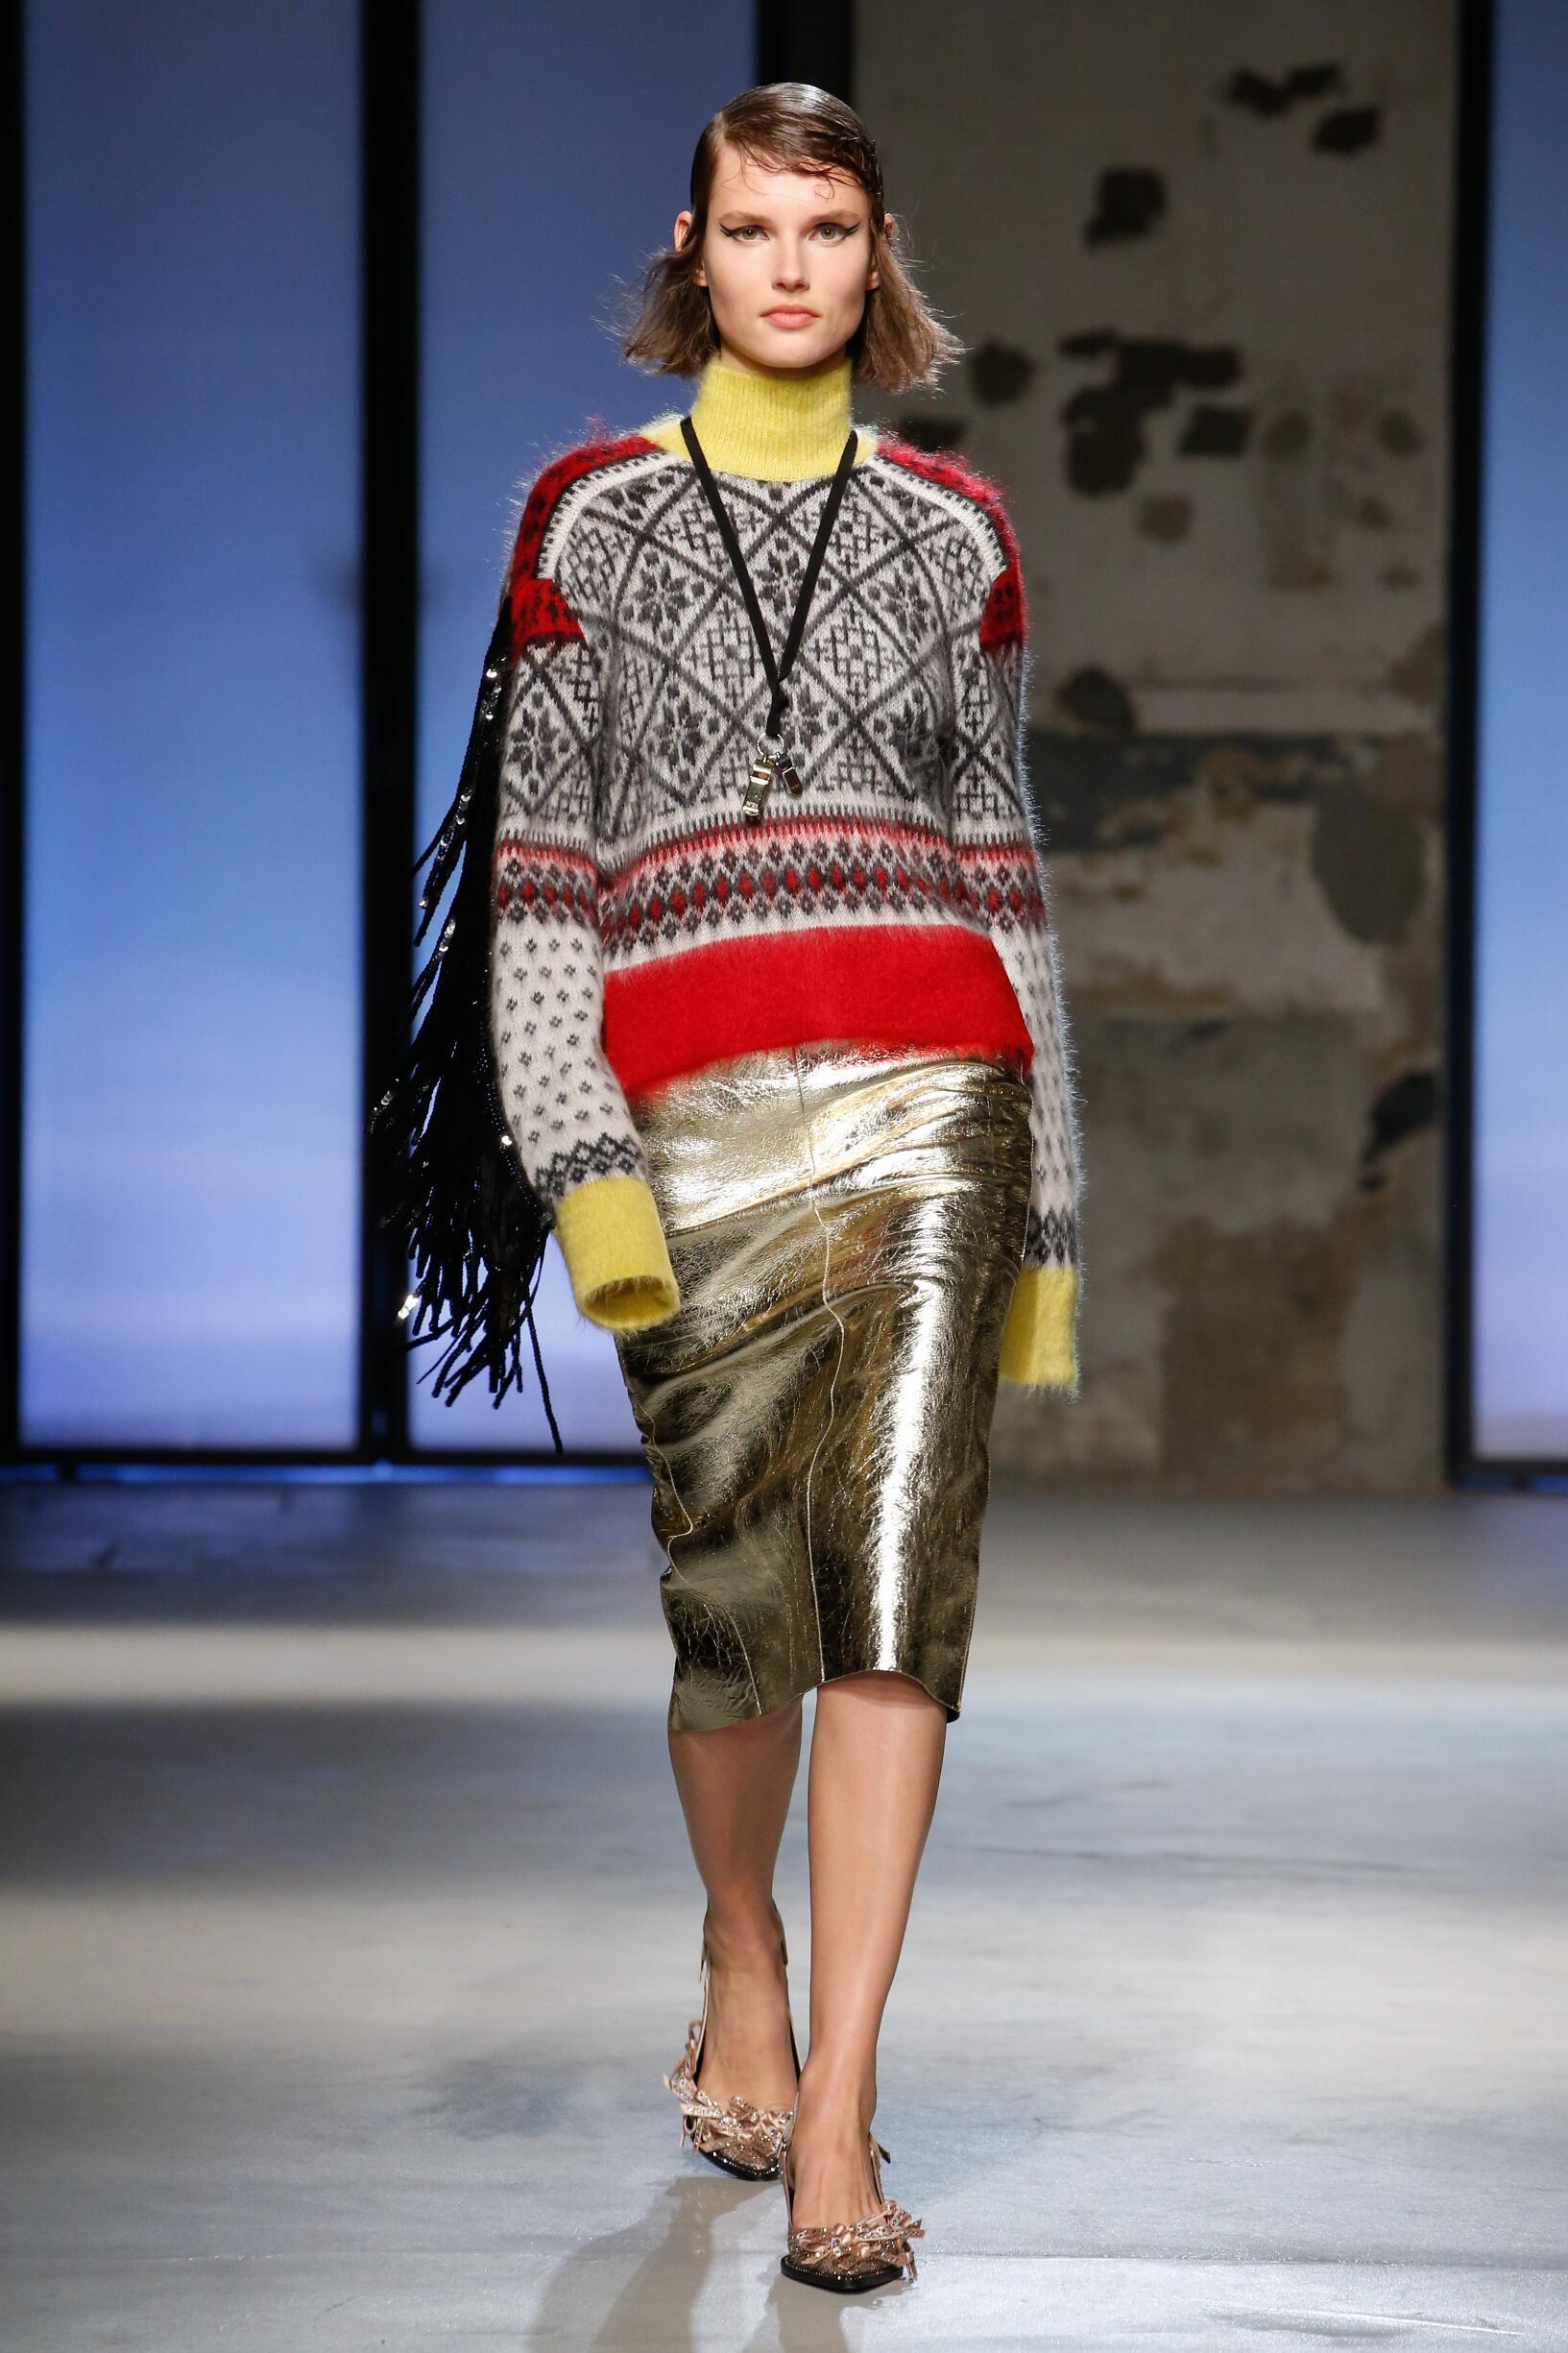 Catwalk N°21 Woman Fashion Show Winter 2018